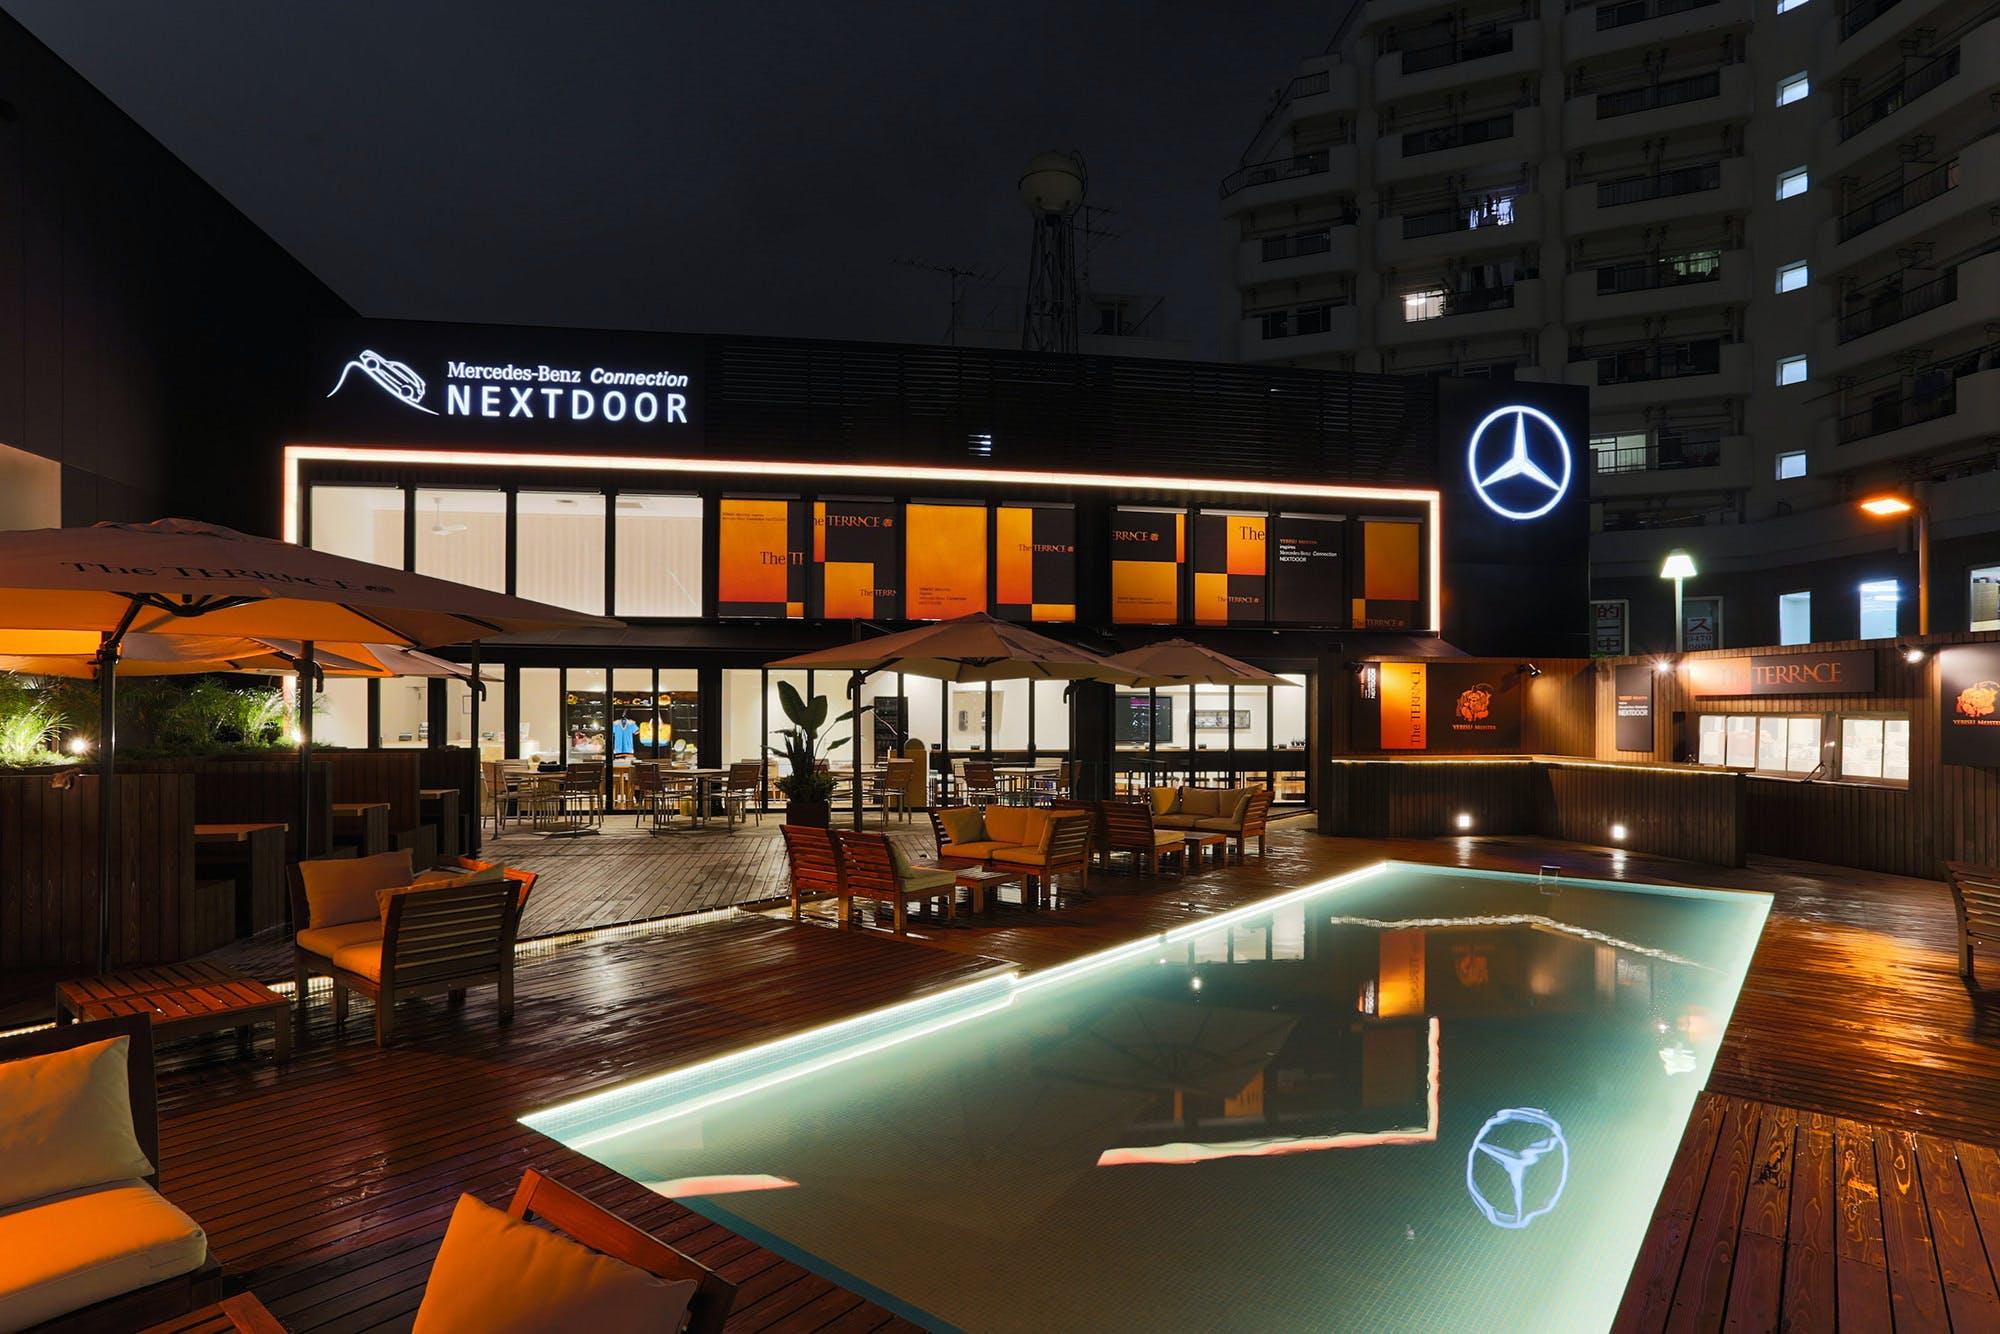 Mercedes-Benz Connection NEXTDOOR �uThe TERRACE�v